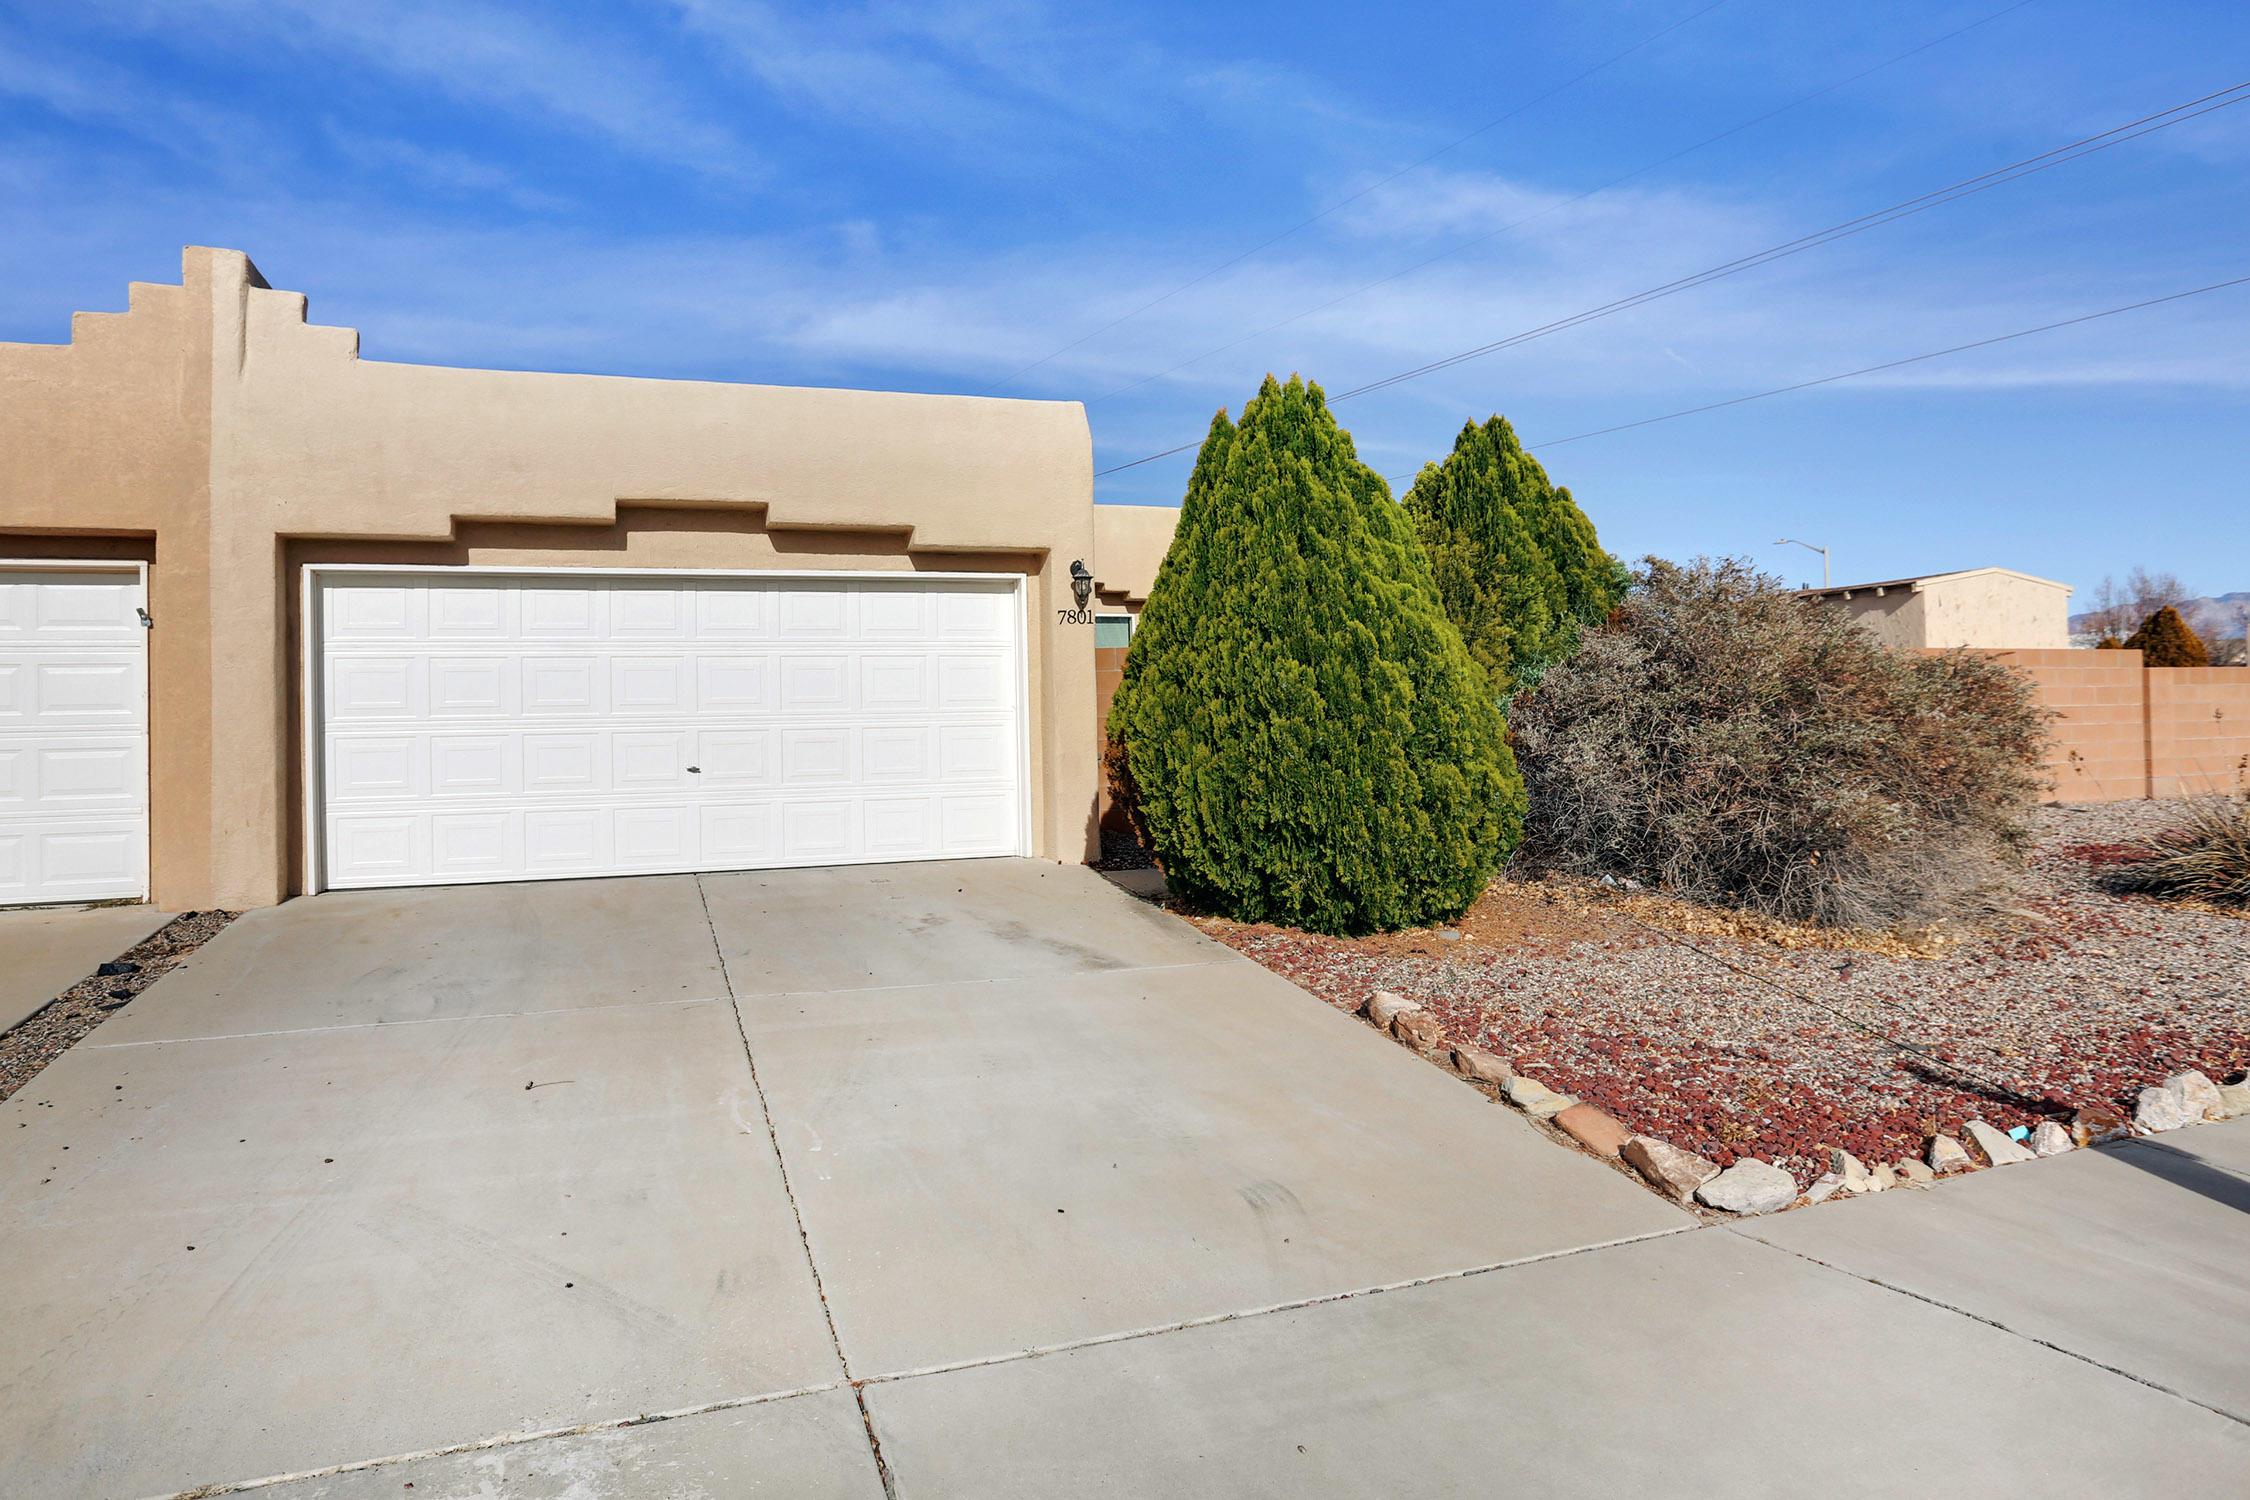 7801 NW Al Street, Northwest Albuquerque and Northwest Heights, New Mexico